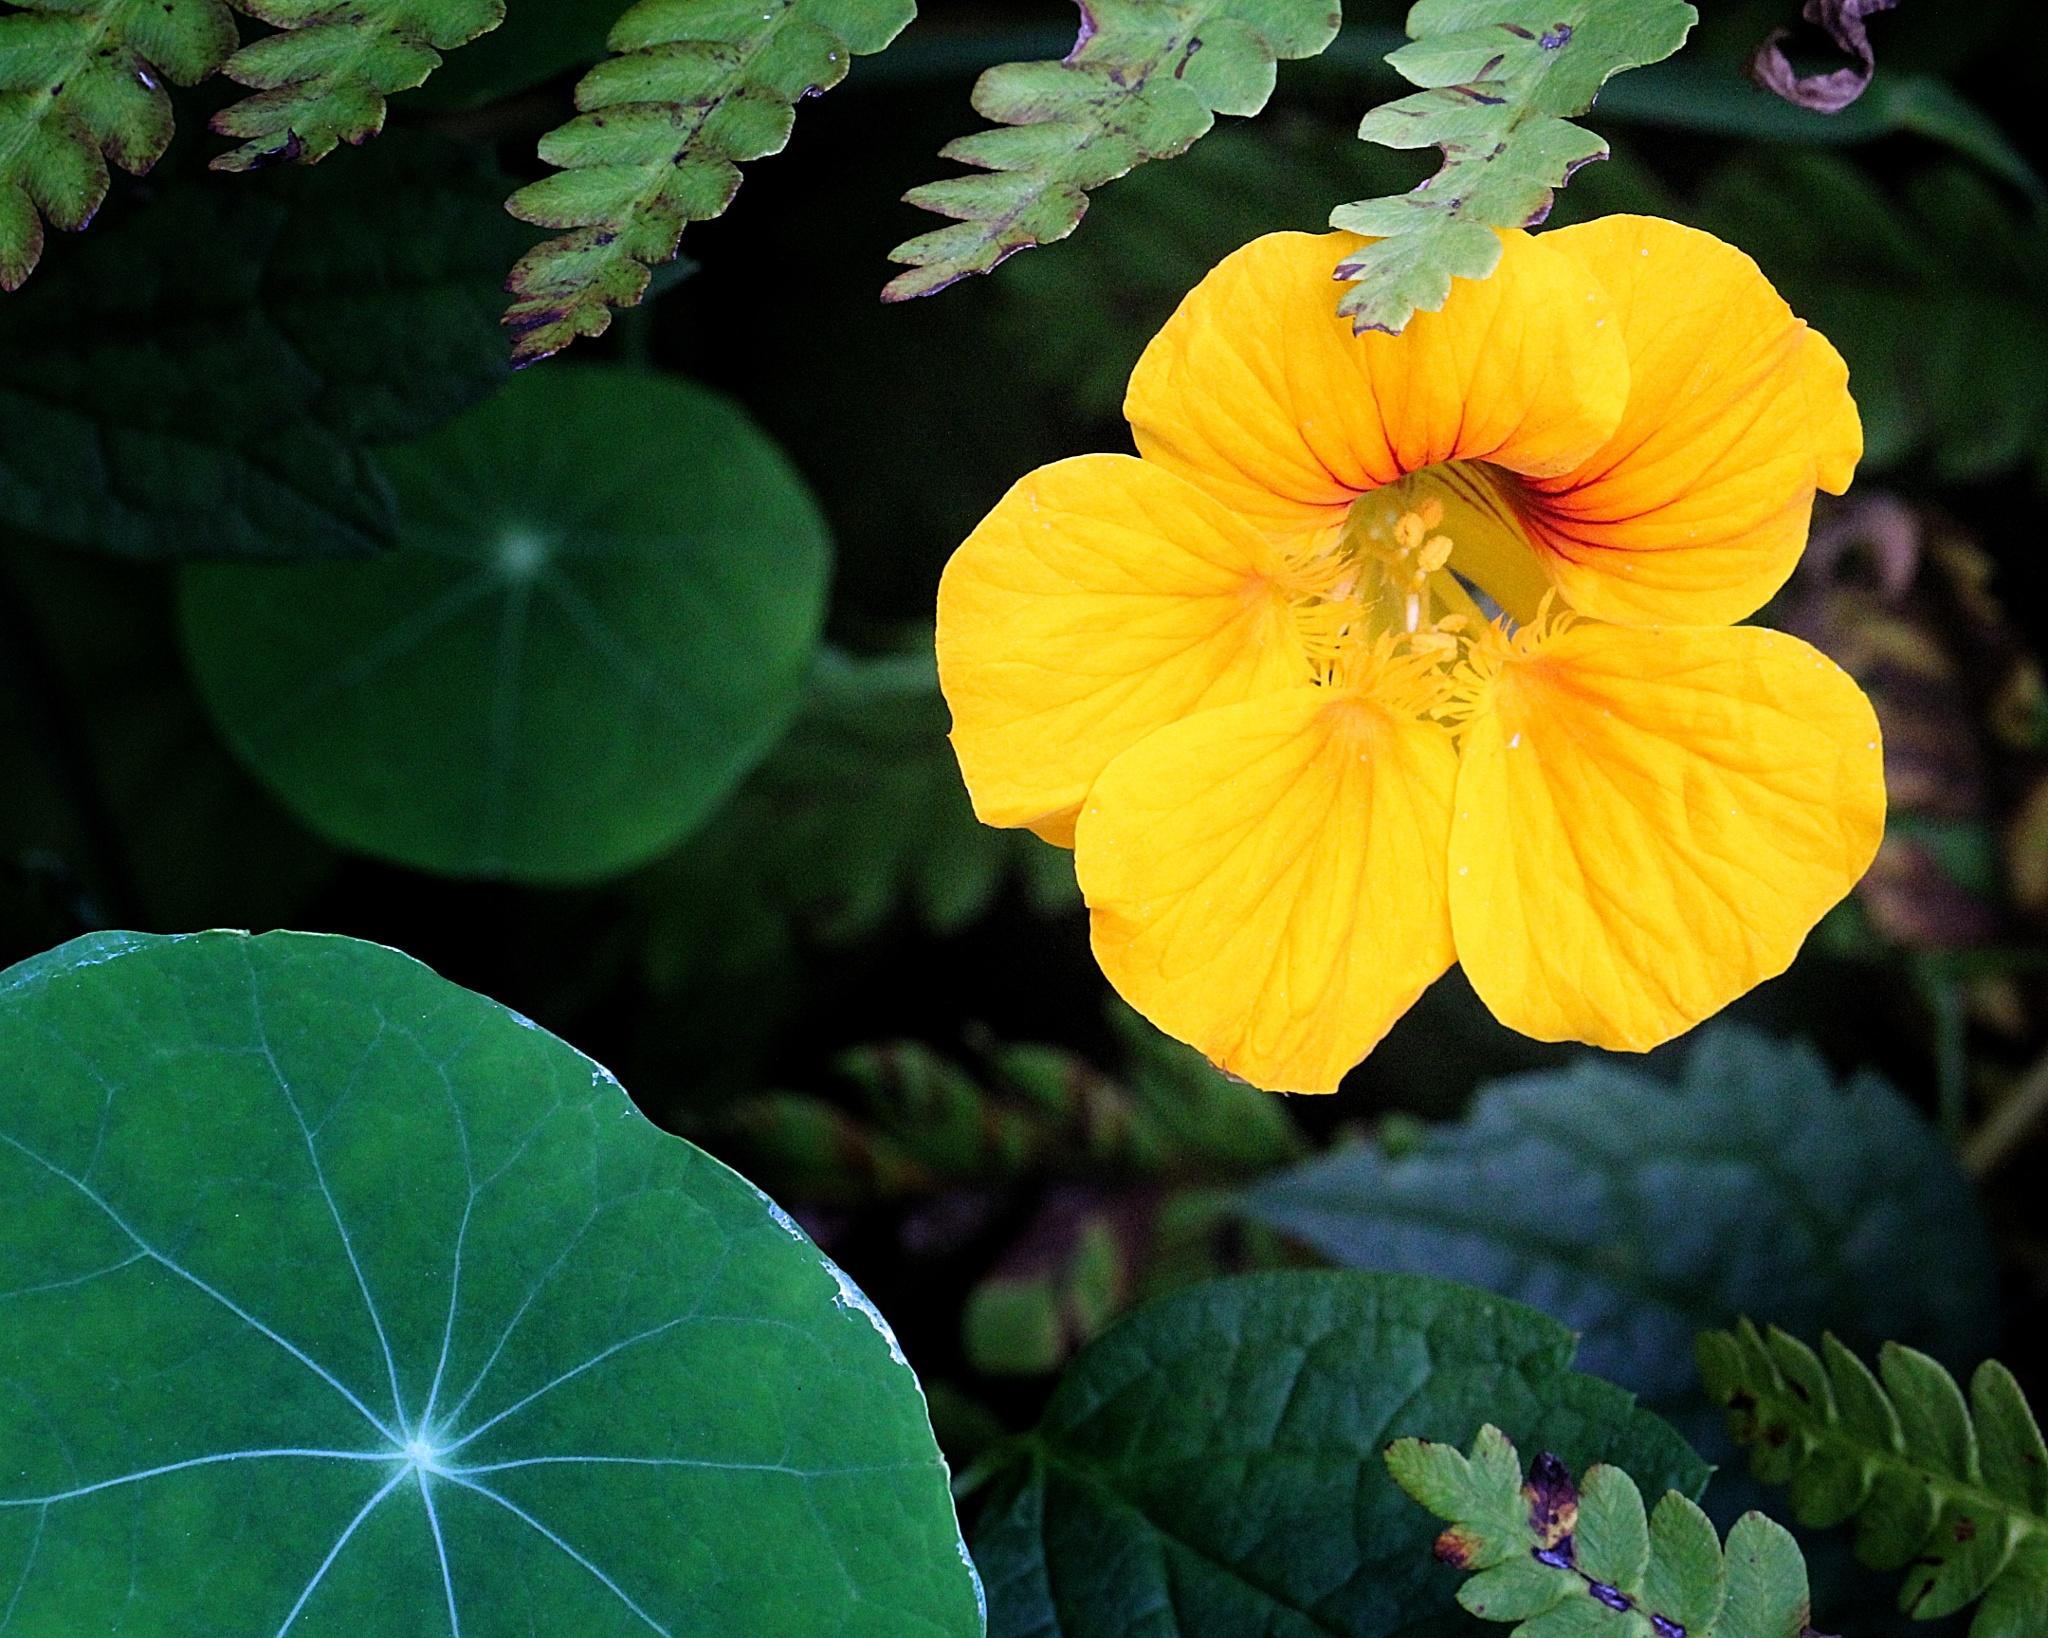 North Carolina Wildflower by Lyndon Haston